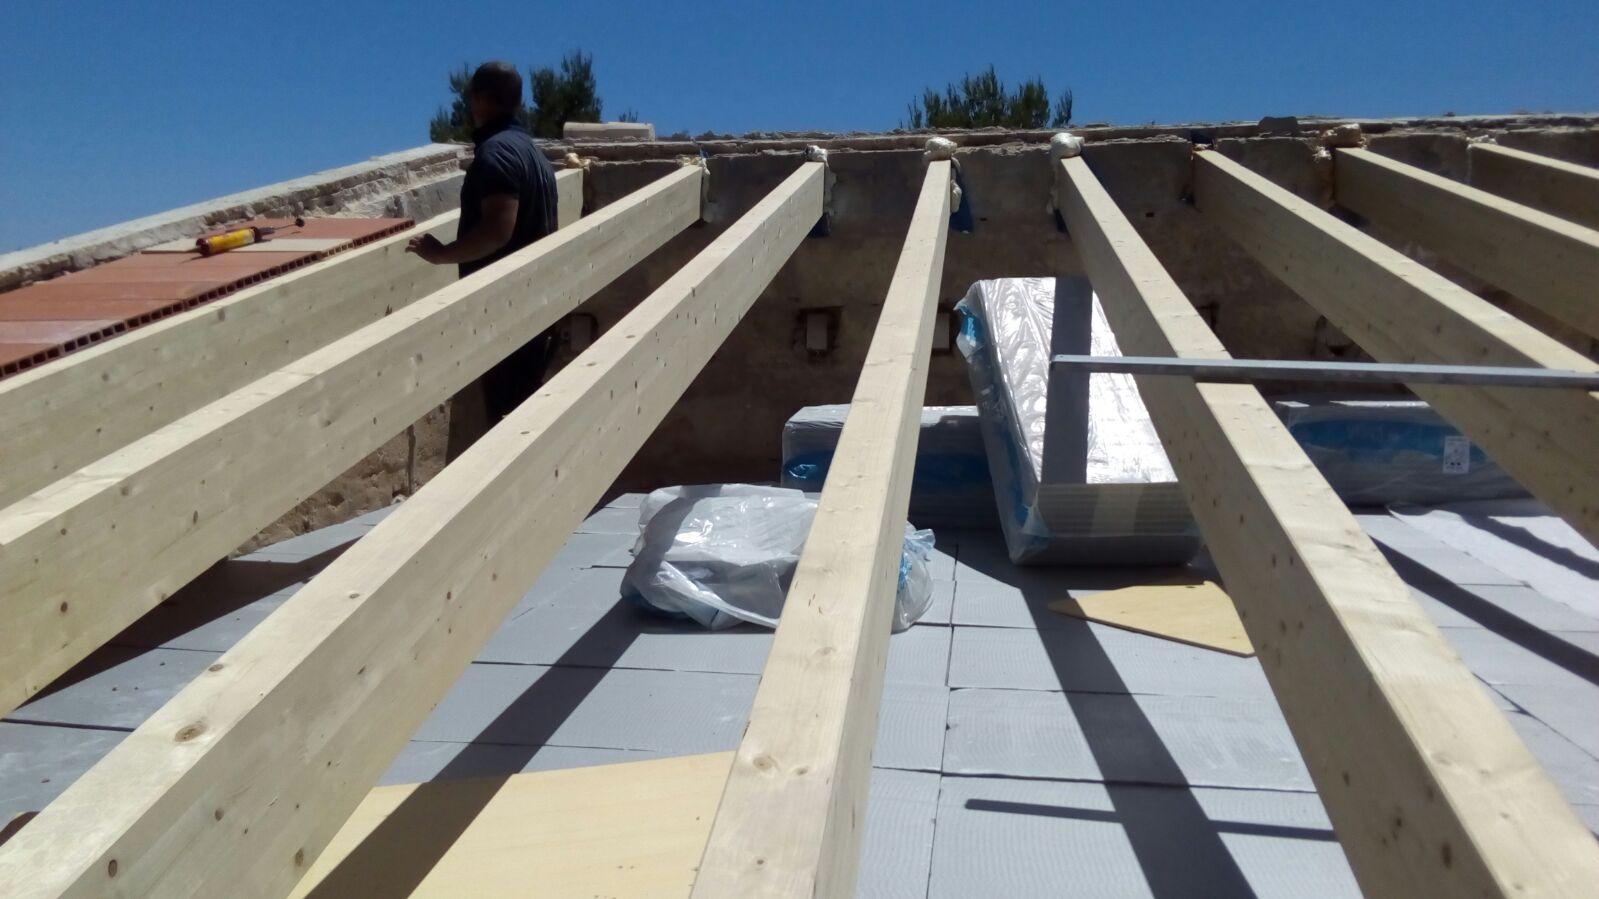 Dachstuhl auf Mallorca